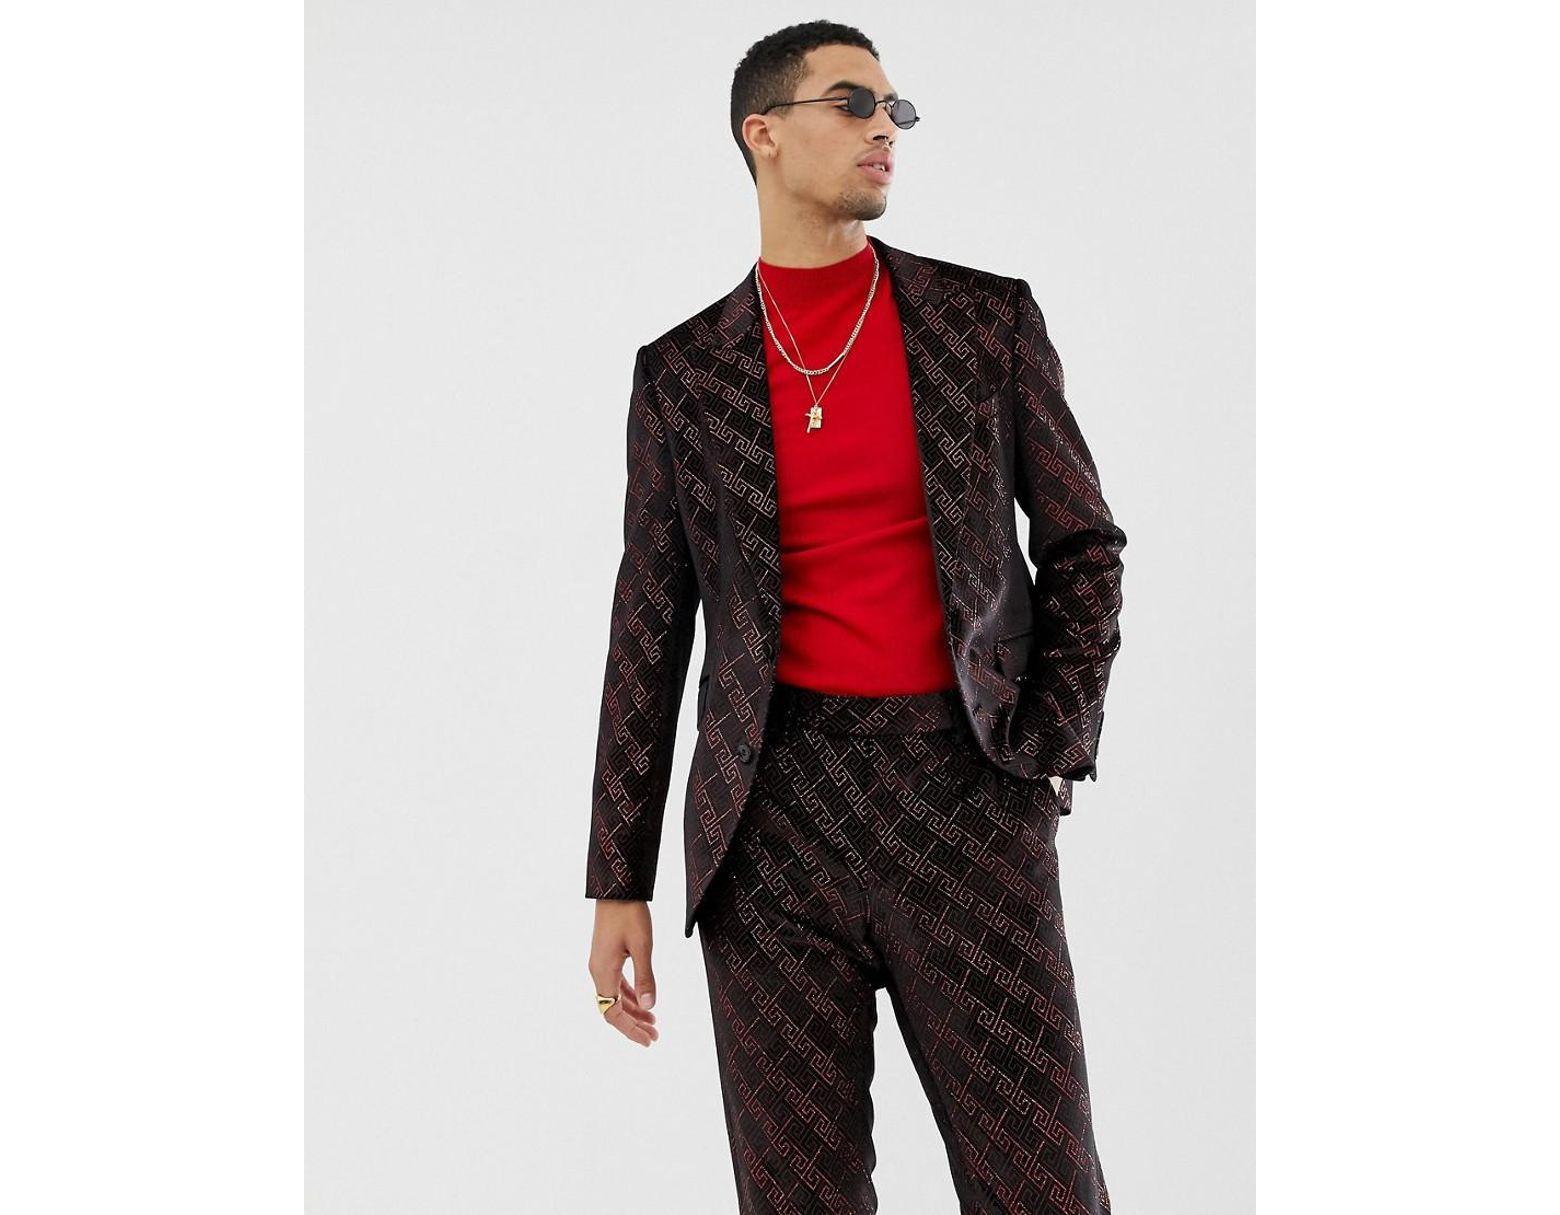 092b29a137135 ASOS Super Skinny Suit Jacket In Velvet With Red Glitter Design in Red for  Men - Lyst